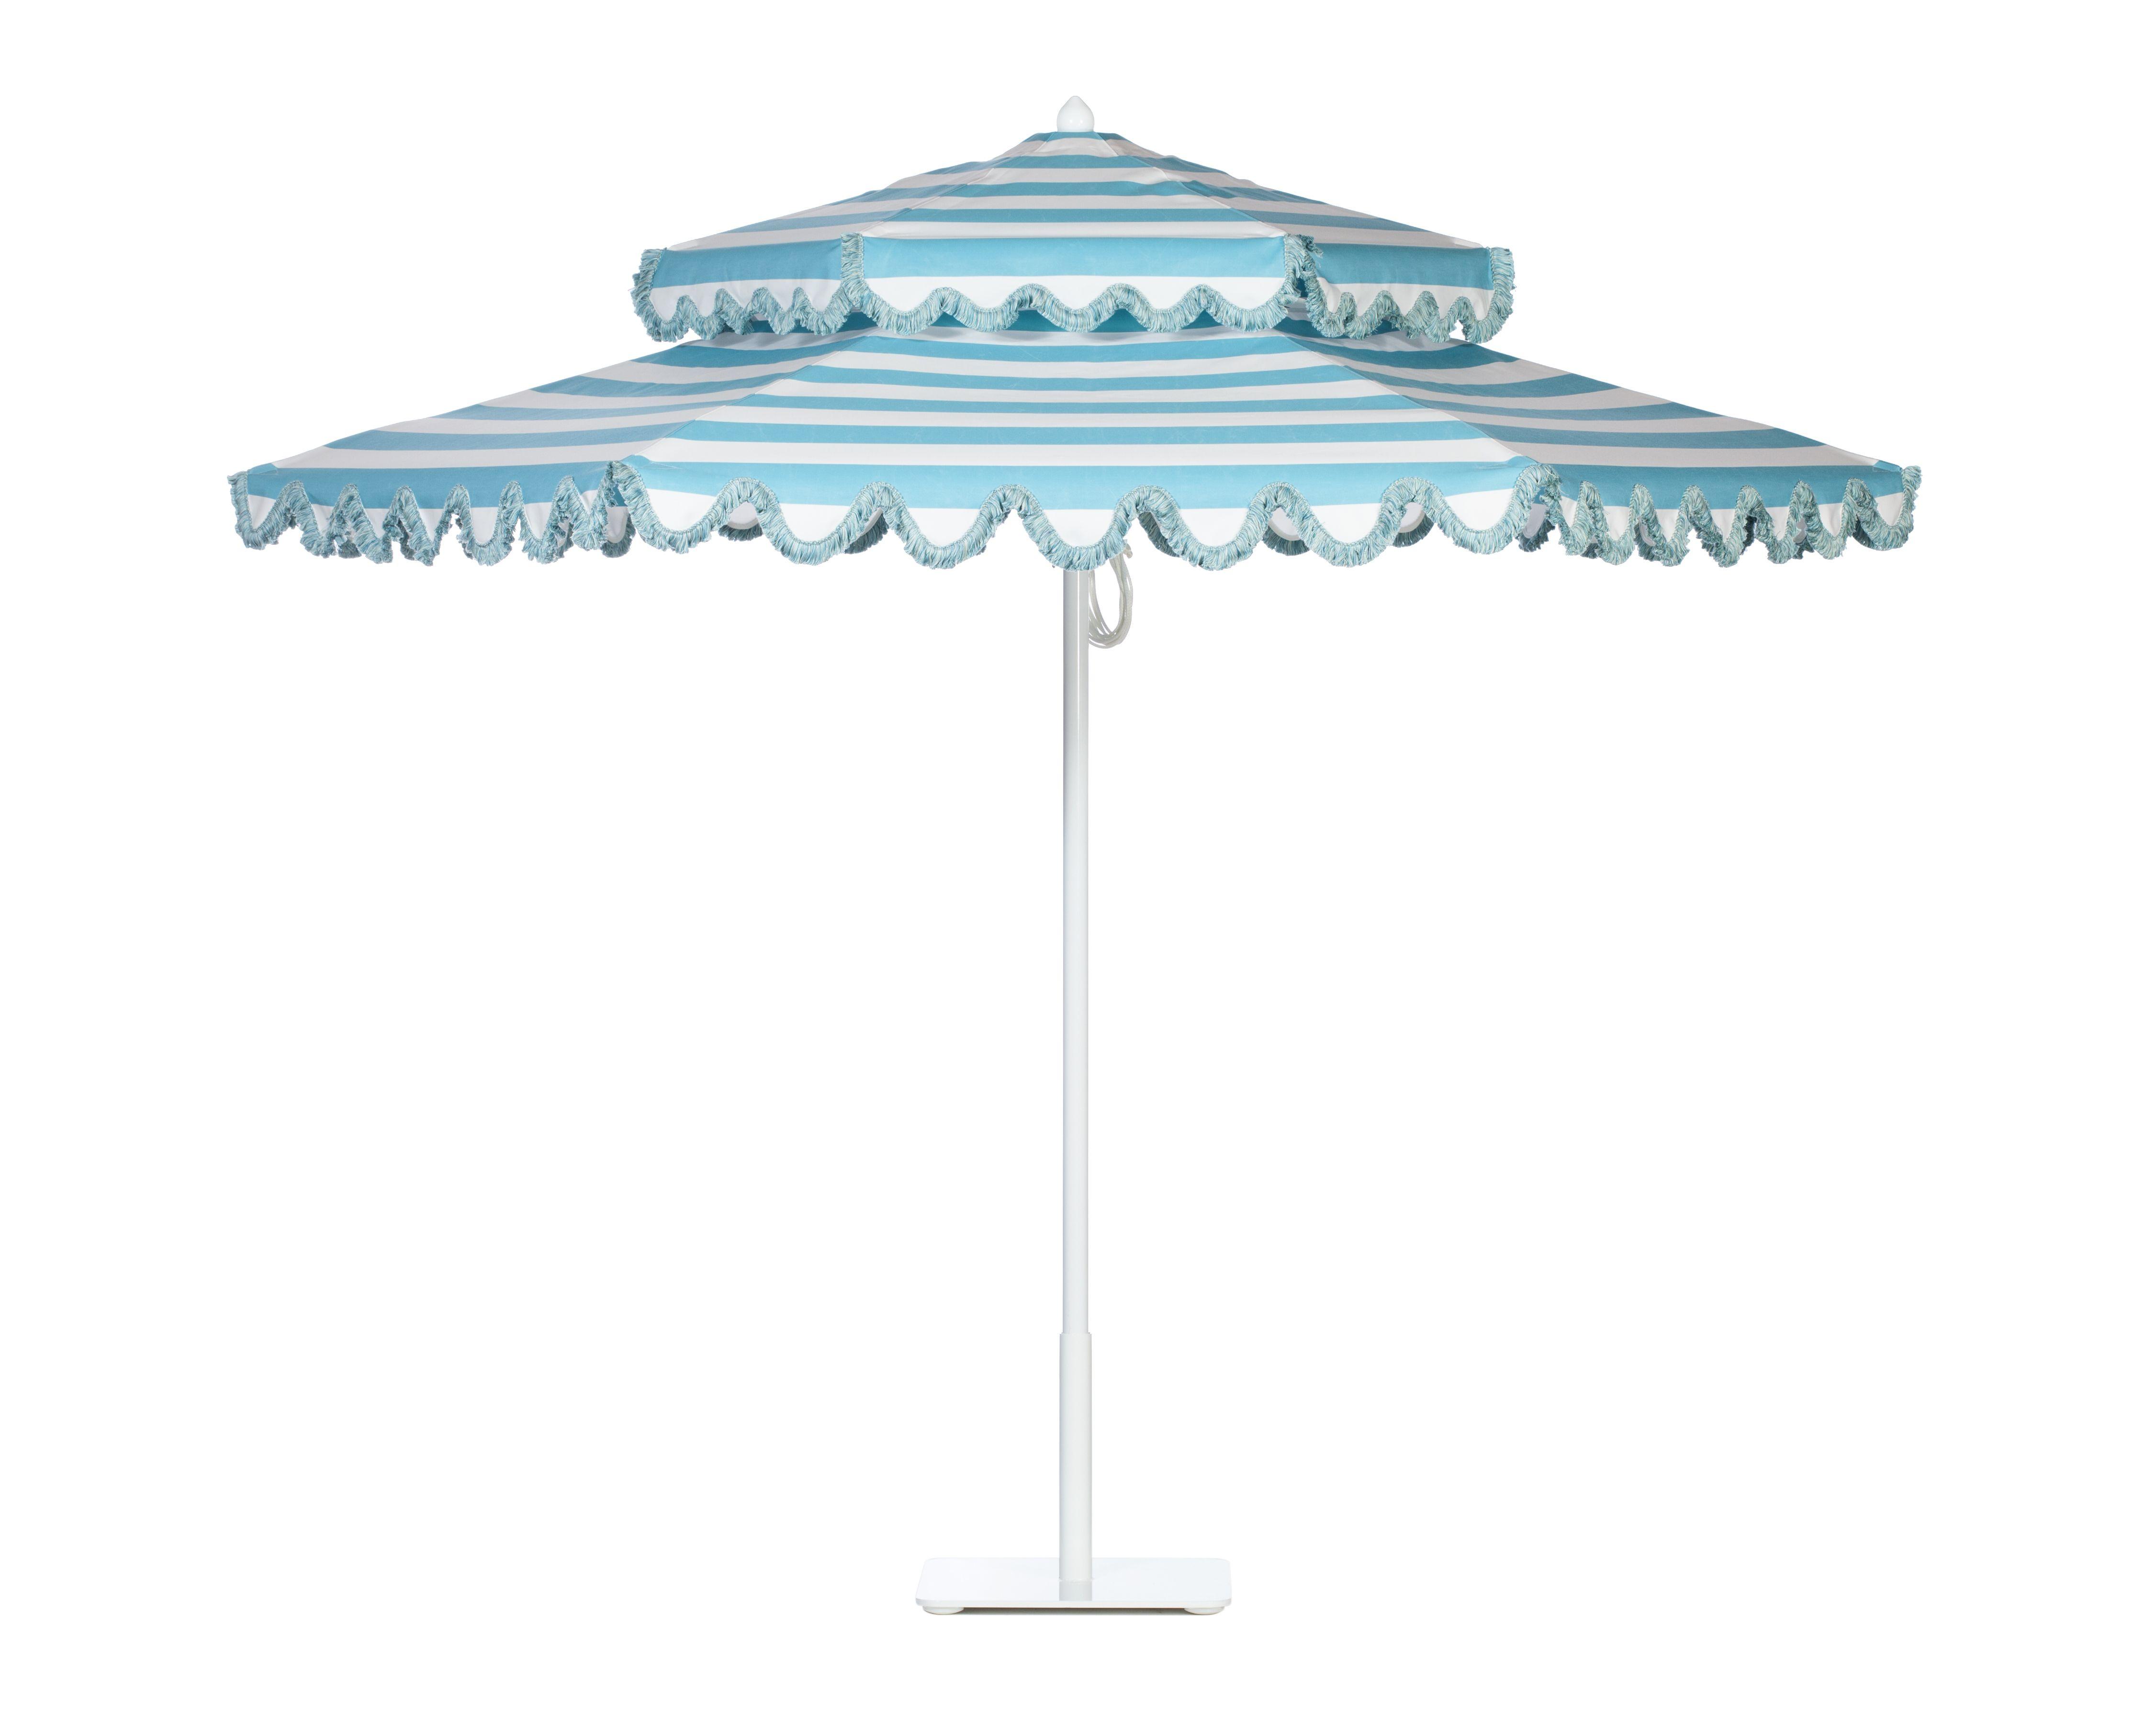 Double Decker aluminum umbrella with White frame in Cabana Aqua Sea ...